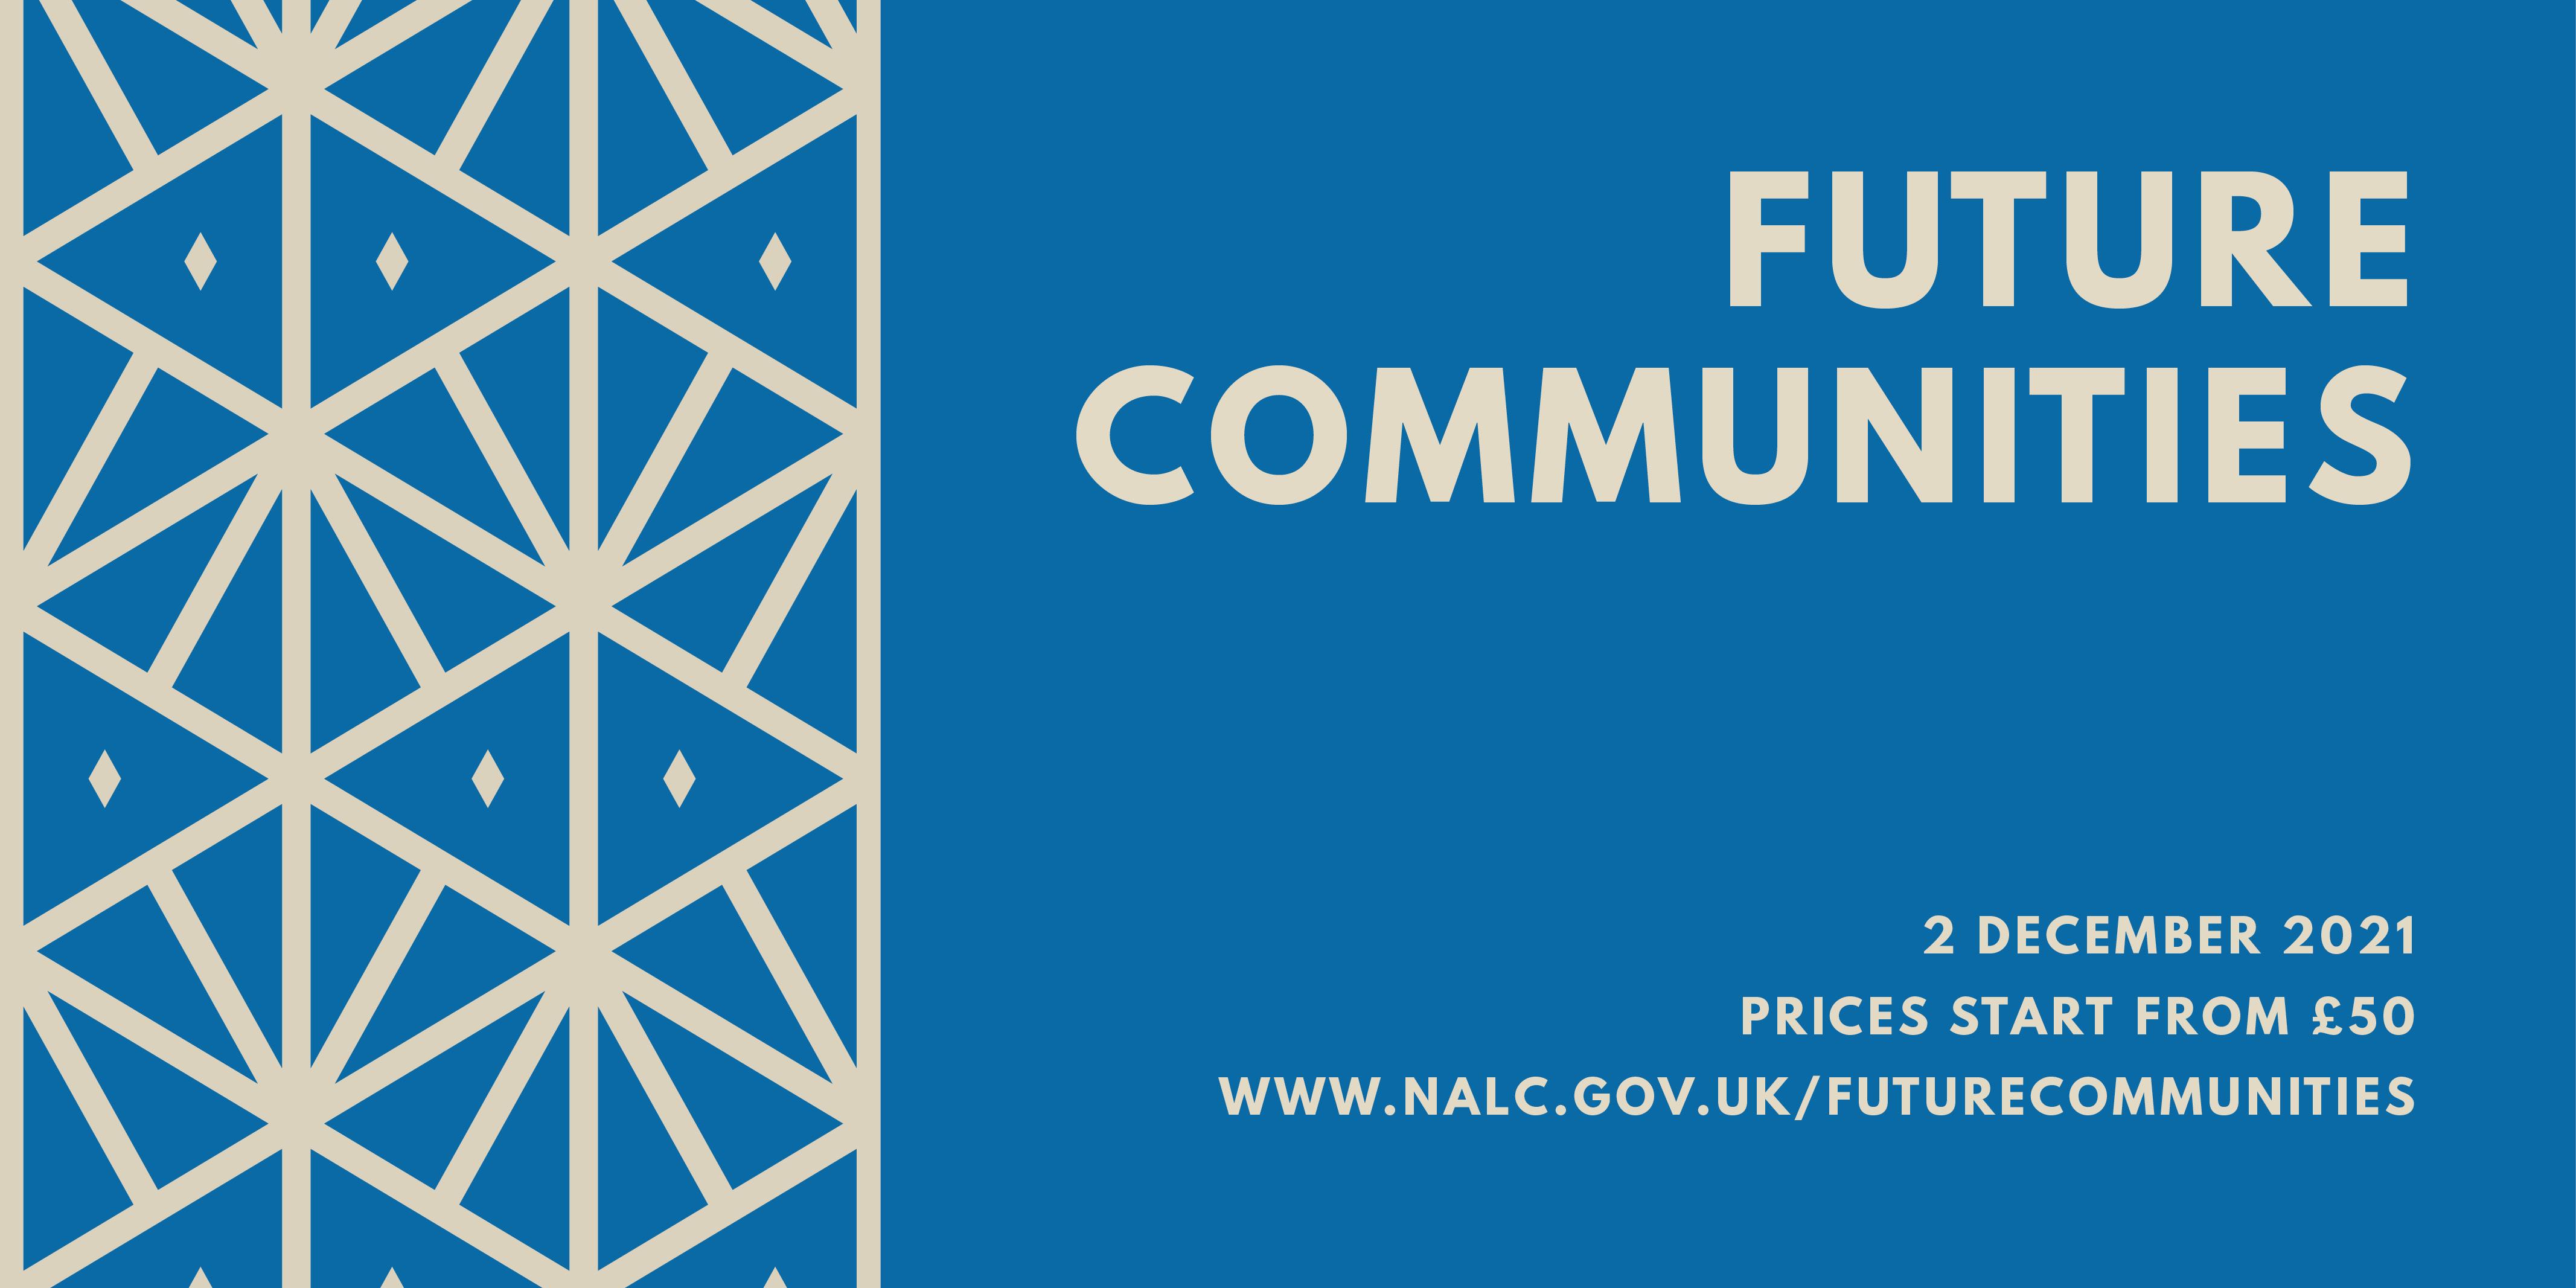 future-communities-twitter-post